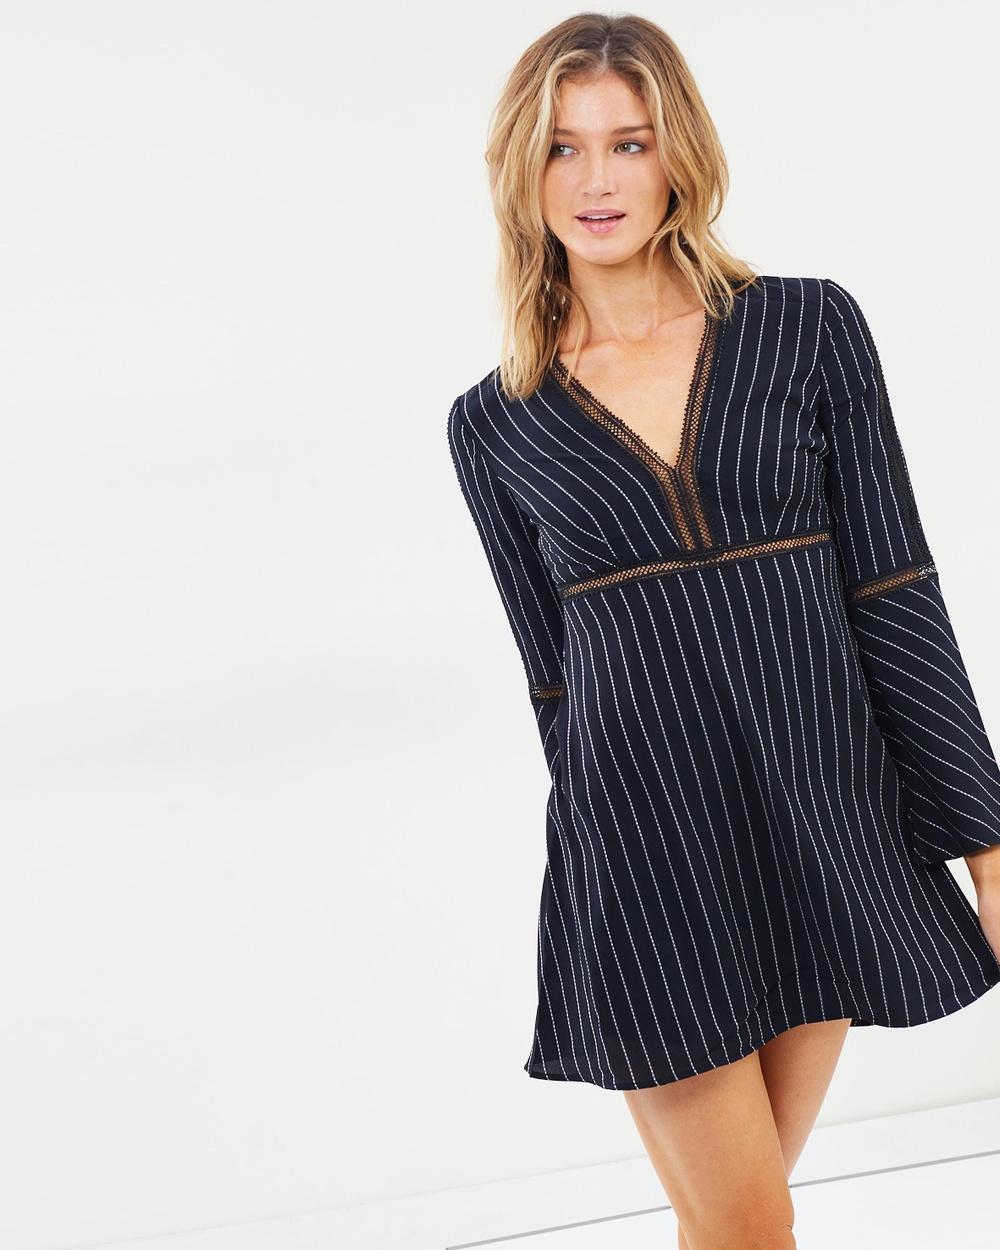 Bardot Pinstripe Dress Dresses Black Pinstripe Dress